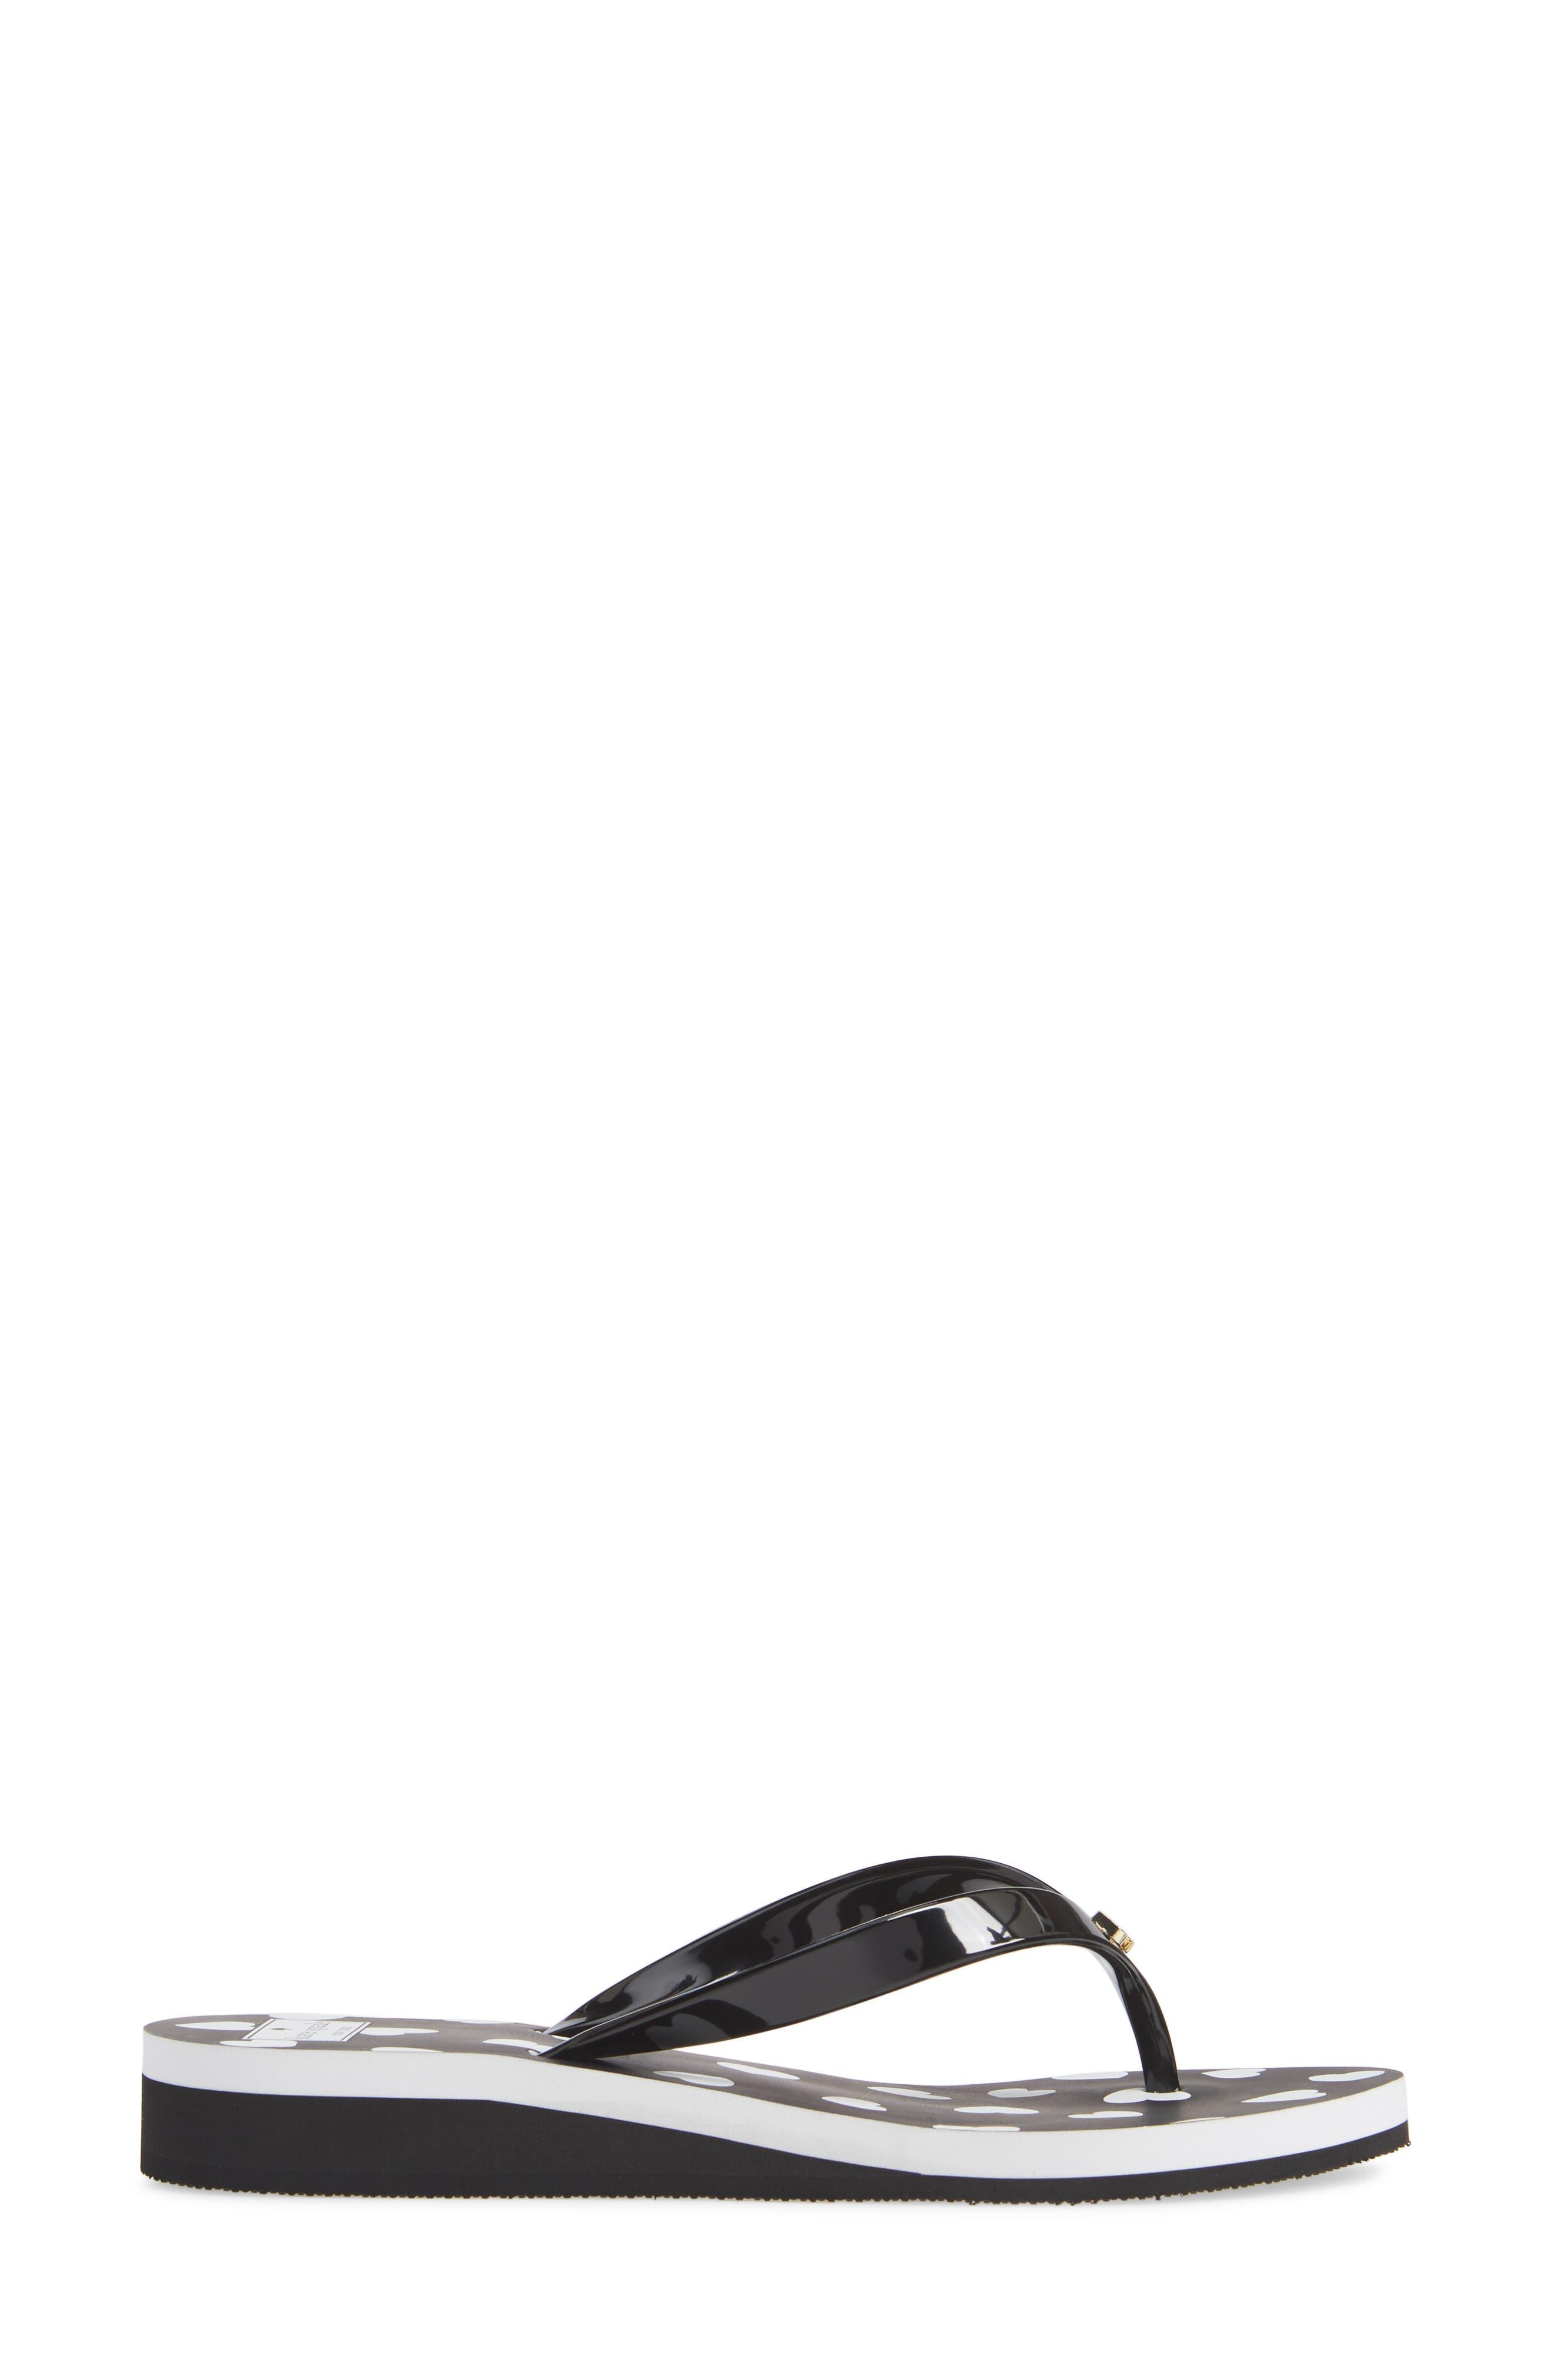 KATE SPADE NEW YORK, milli wedge flip-flop, Alternate thumbnail 3, color, BLACK/ WHITE HEART